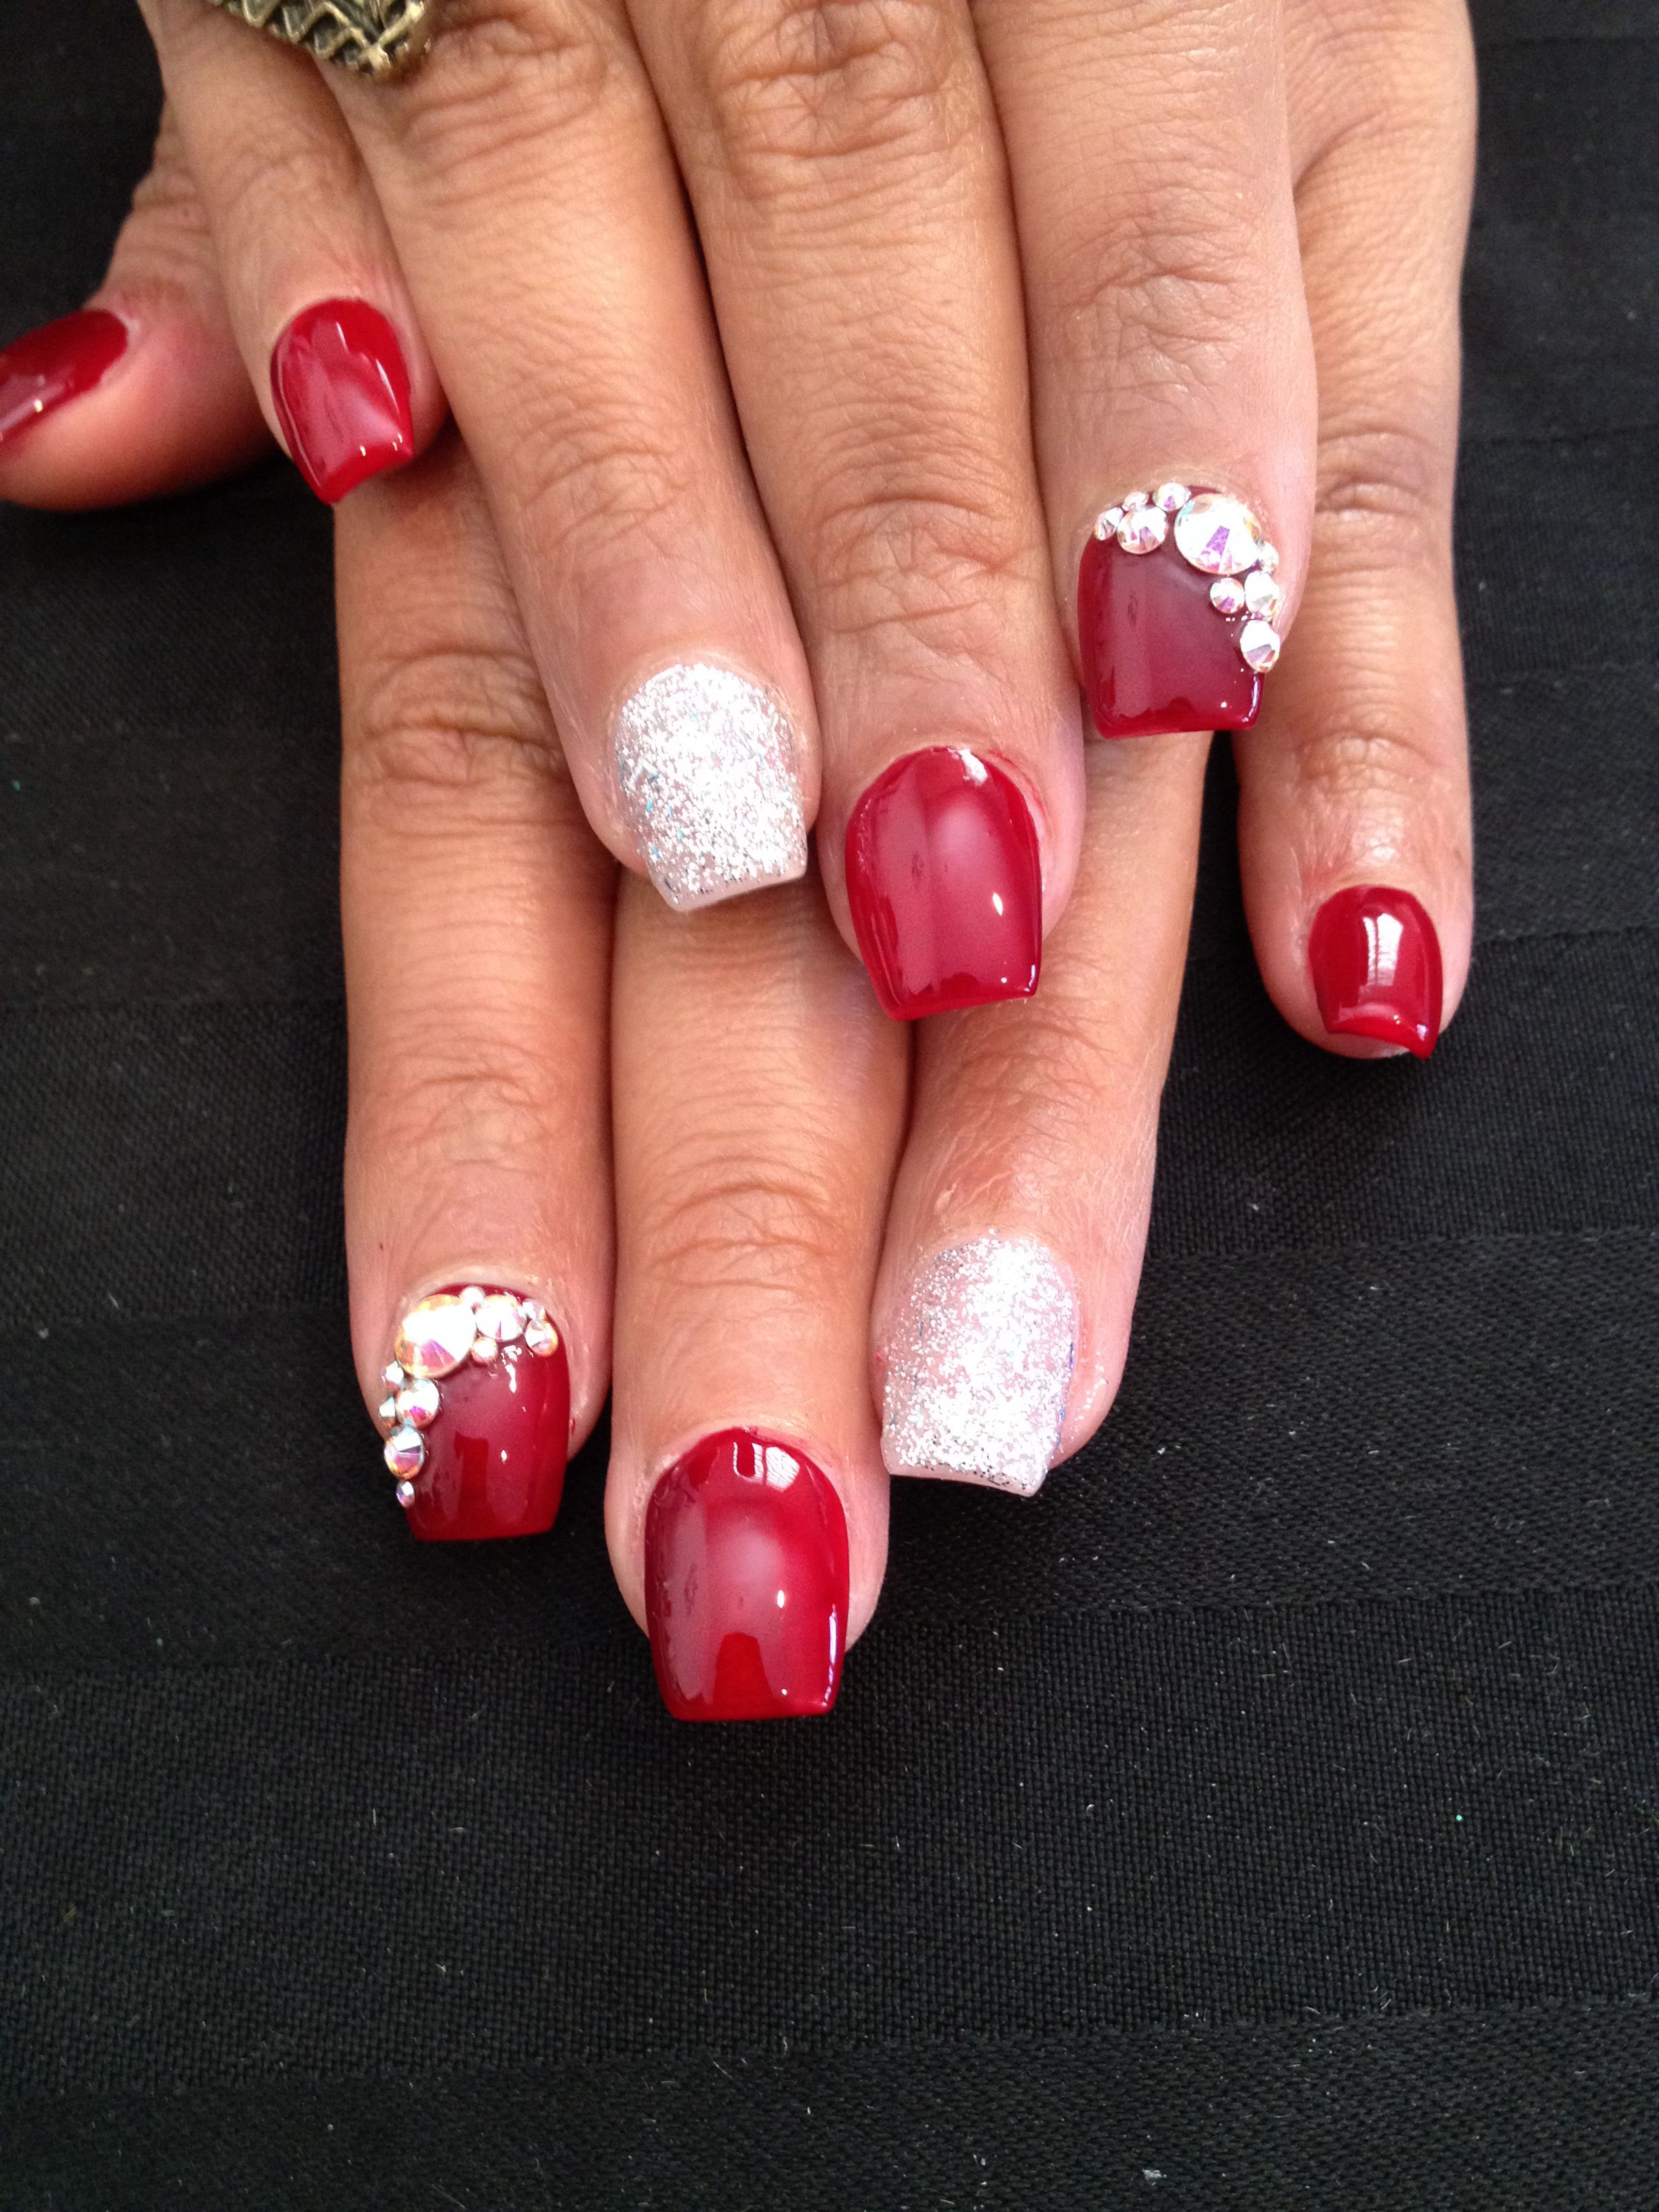 Short Red Coffin Nails Christmas Nails Acrylic Christmas Nails Short Acrylic Nails